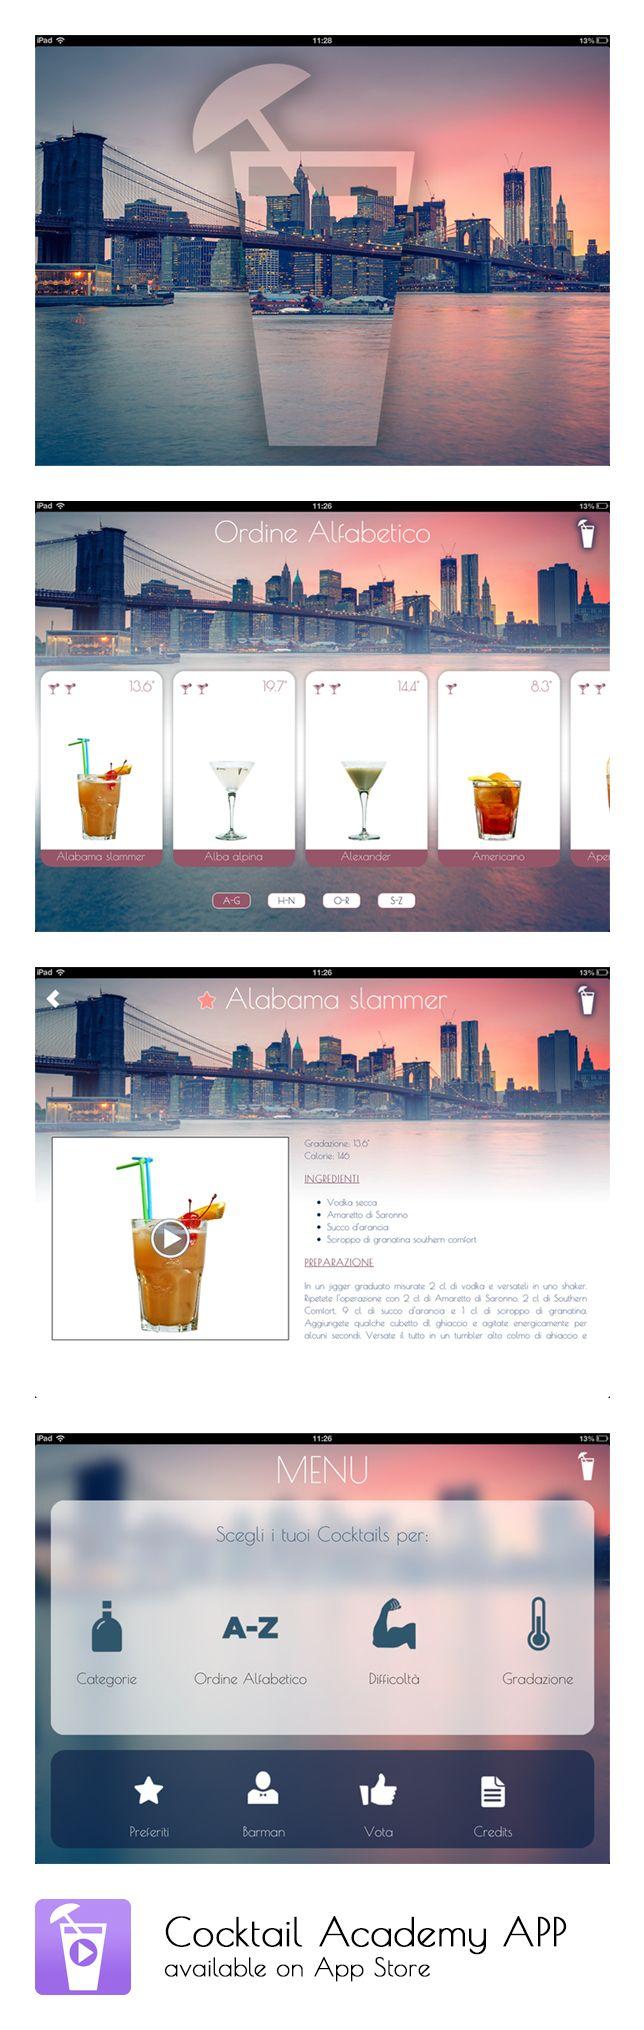 Cocktail Academy APP - App Store: https://itunes.apple.com/app/cocktail-academy-la-prima/id717210160?mt=8